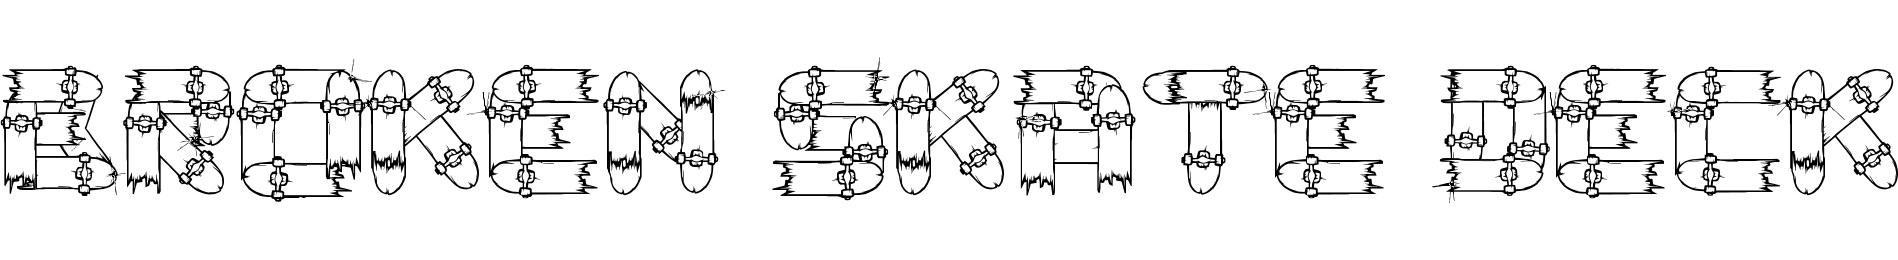 Broken Skate deck